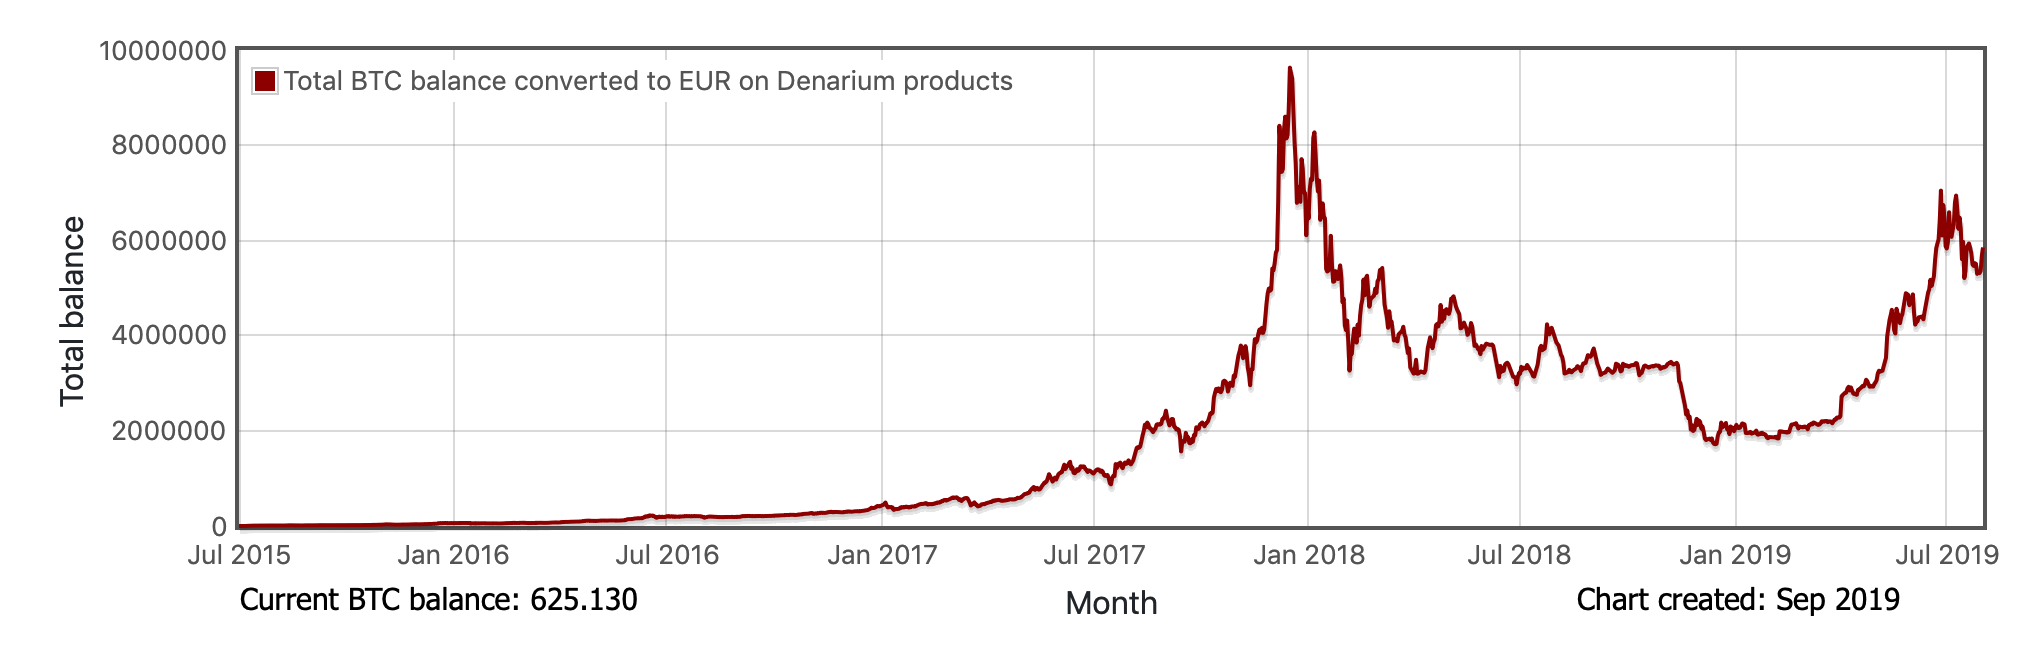 Denarium Bitcoin Total EUR Balance by time